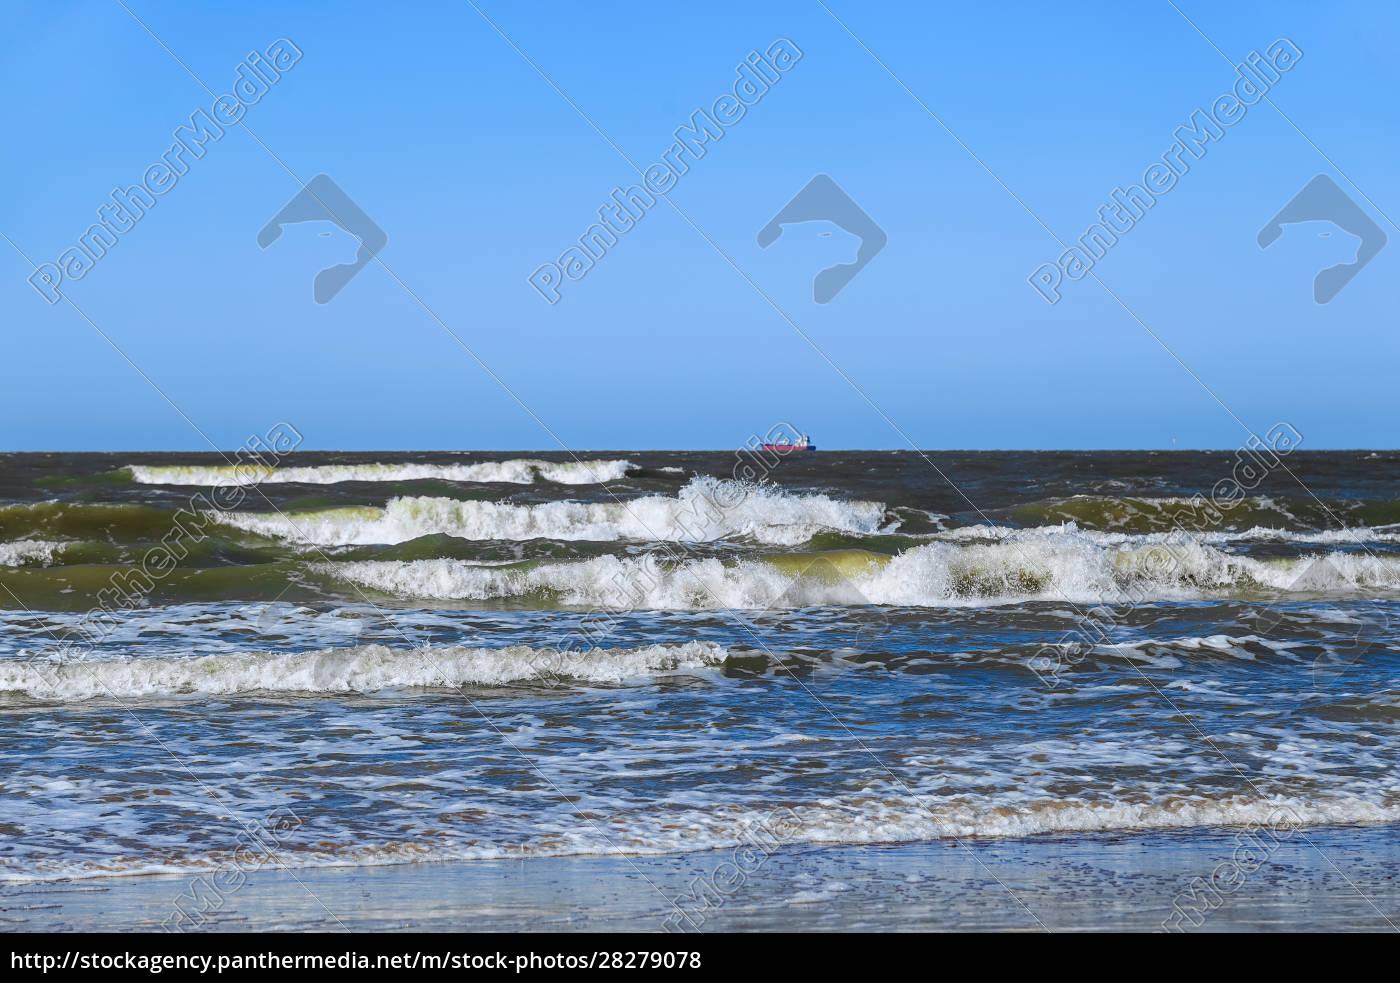 baltic, sea, on, a, clear, sunny - 28279078